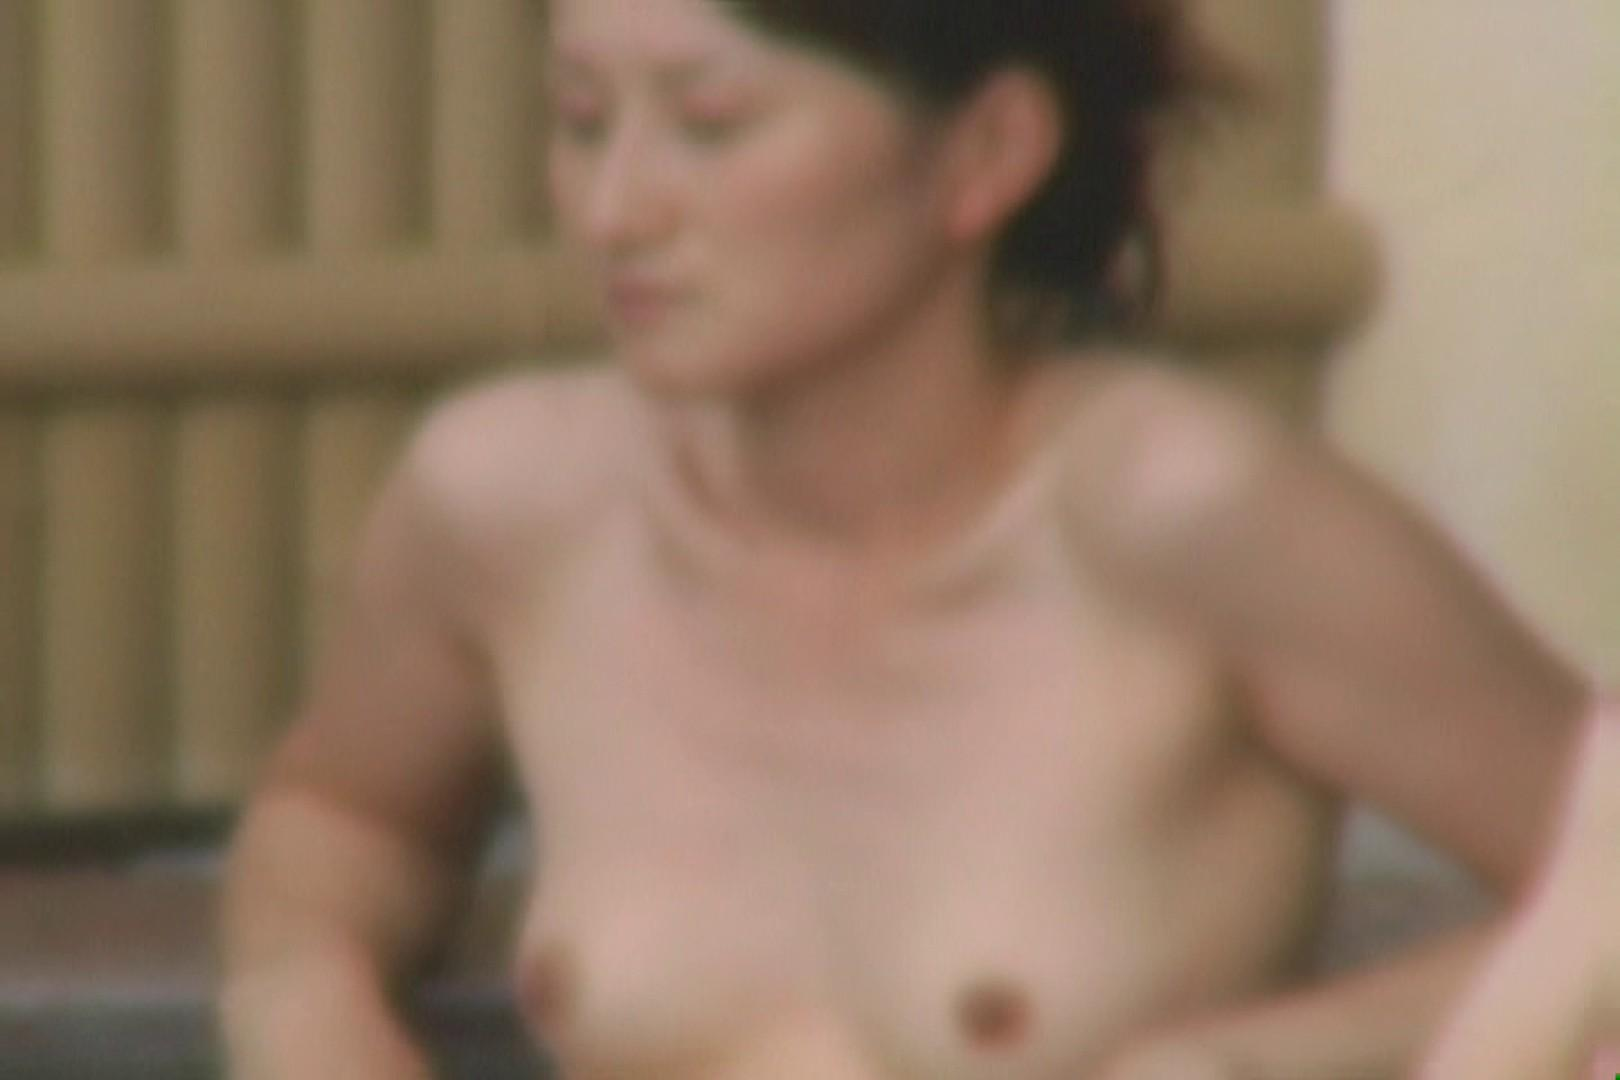 Aquaな露天風呂Vol.578 OL女体 われめAV動画紹介 77連発 26